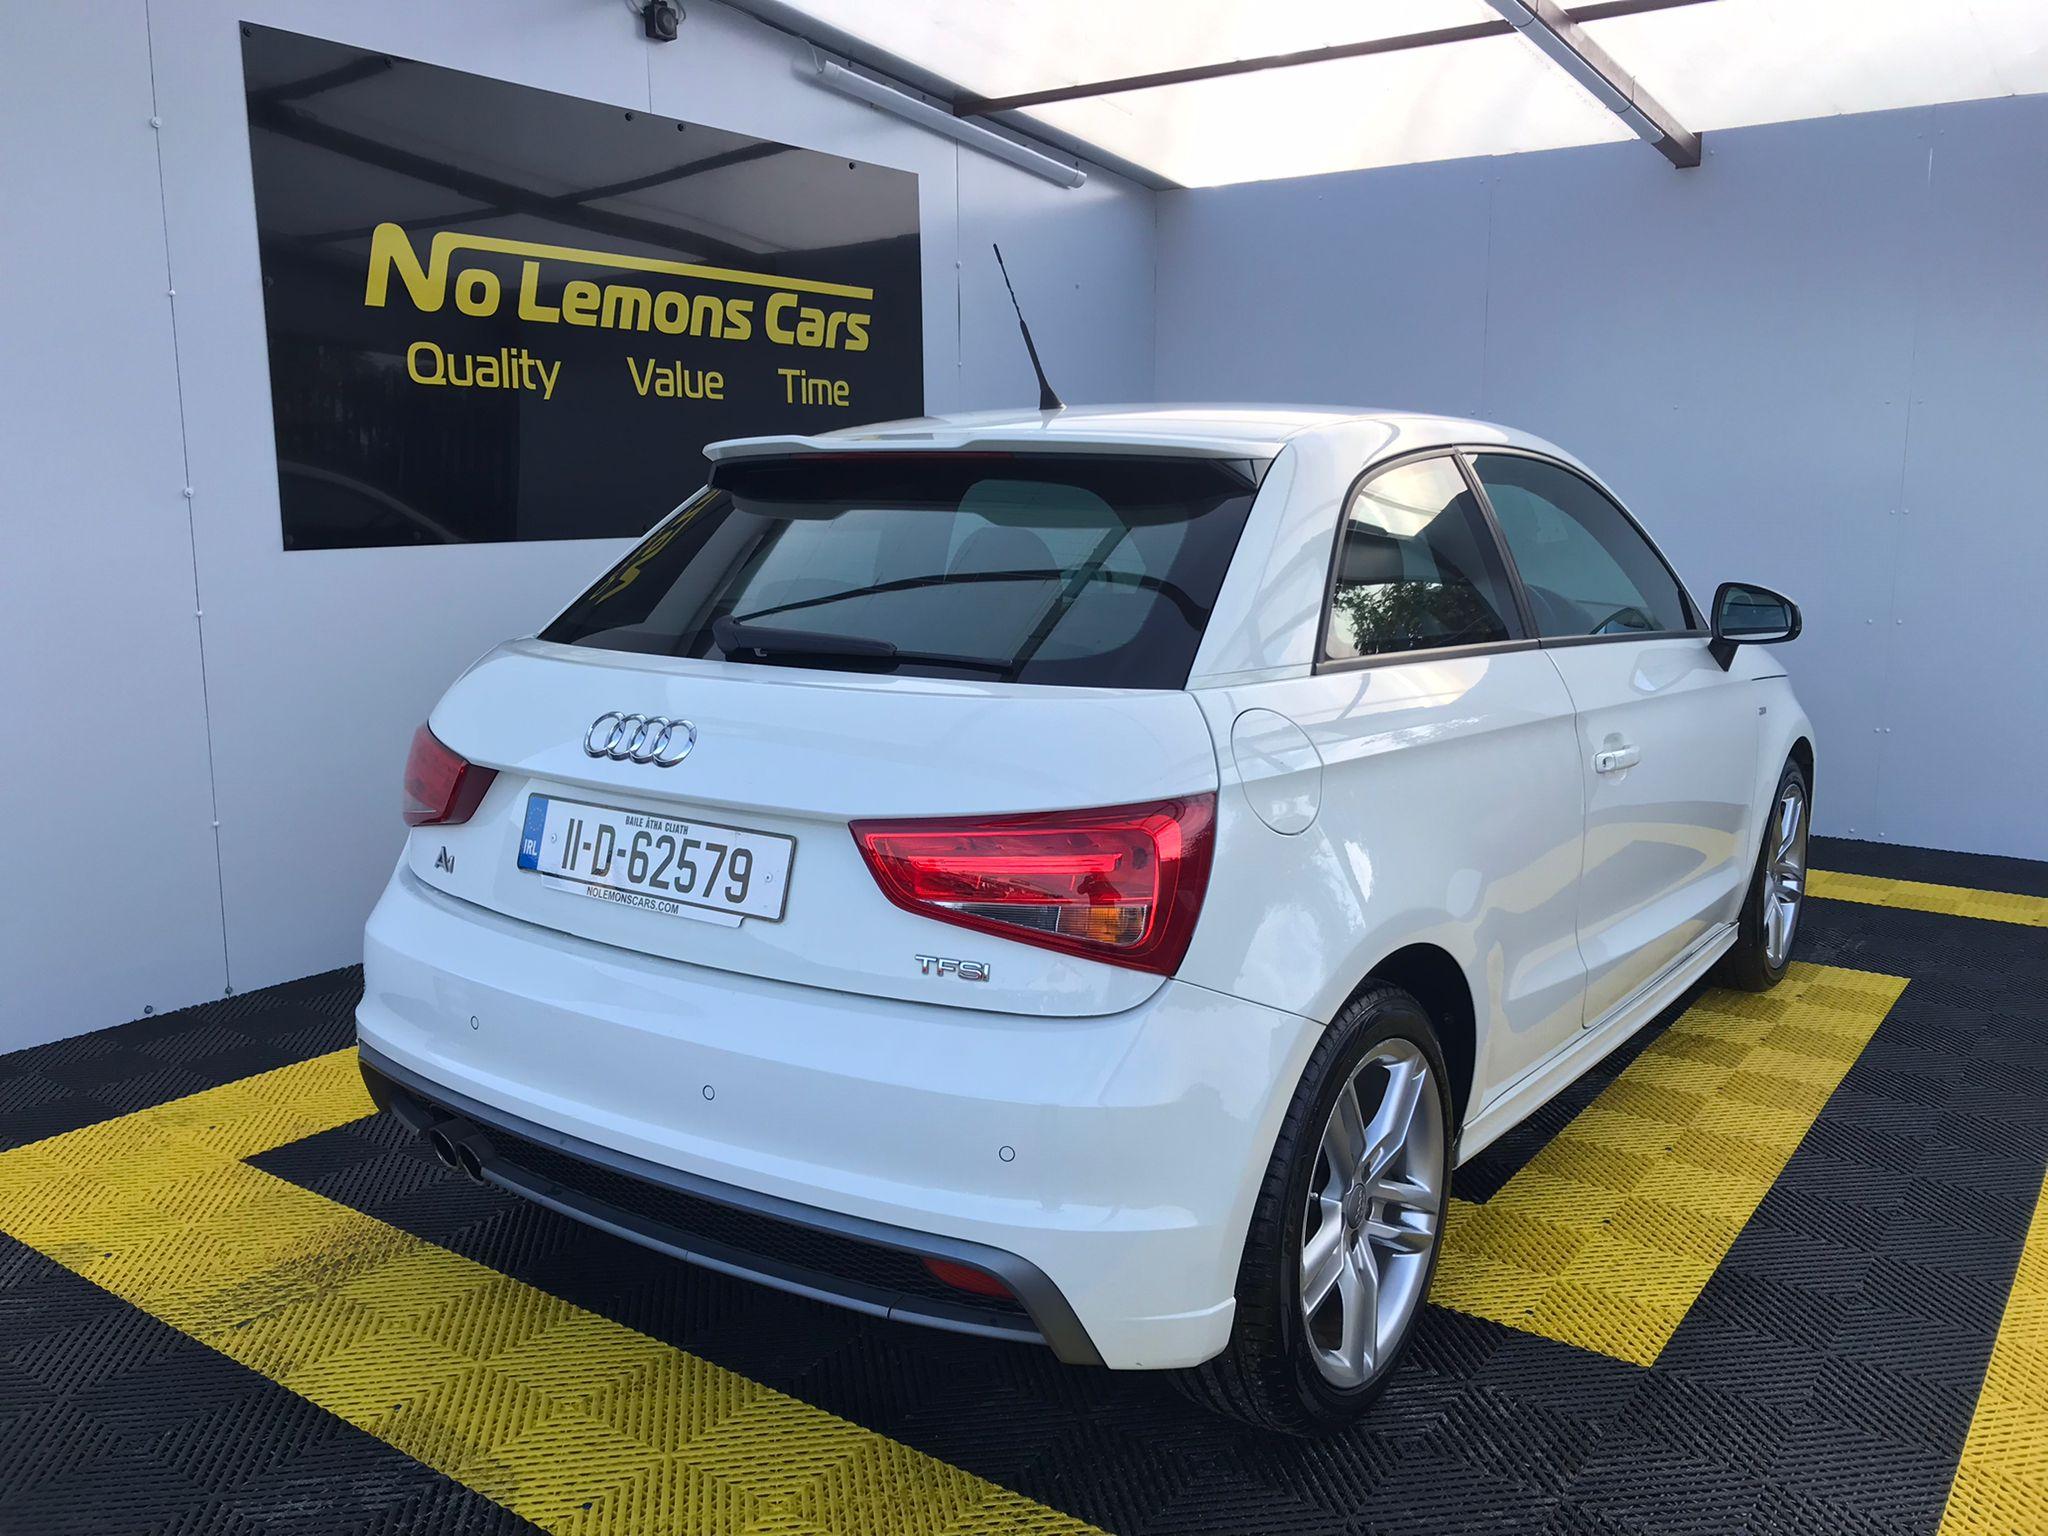 Audi A1 S-Line TFSI 2011 1.4